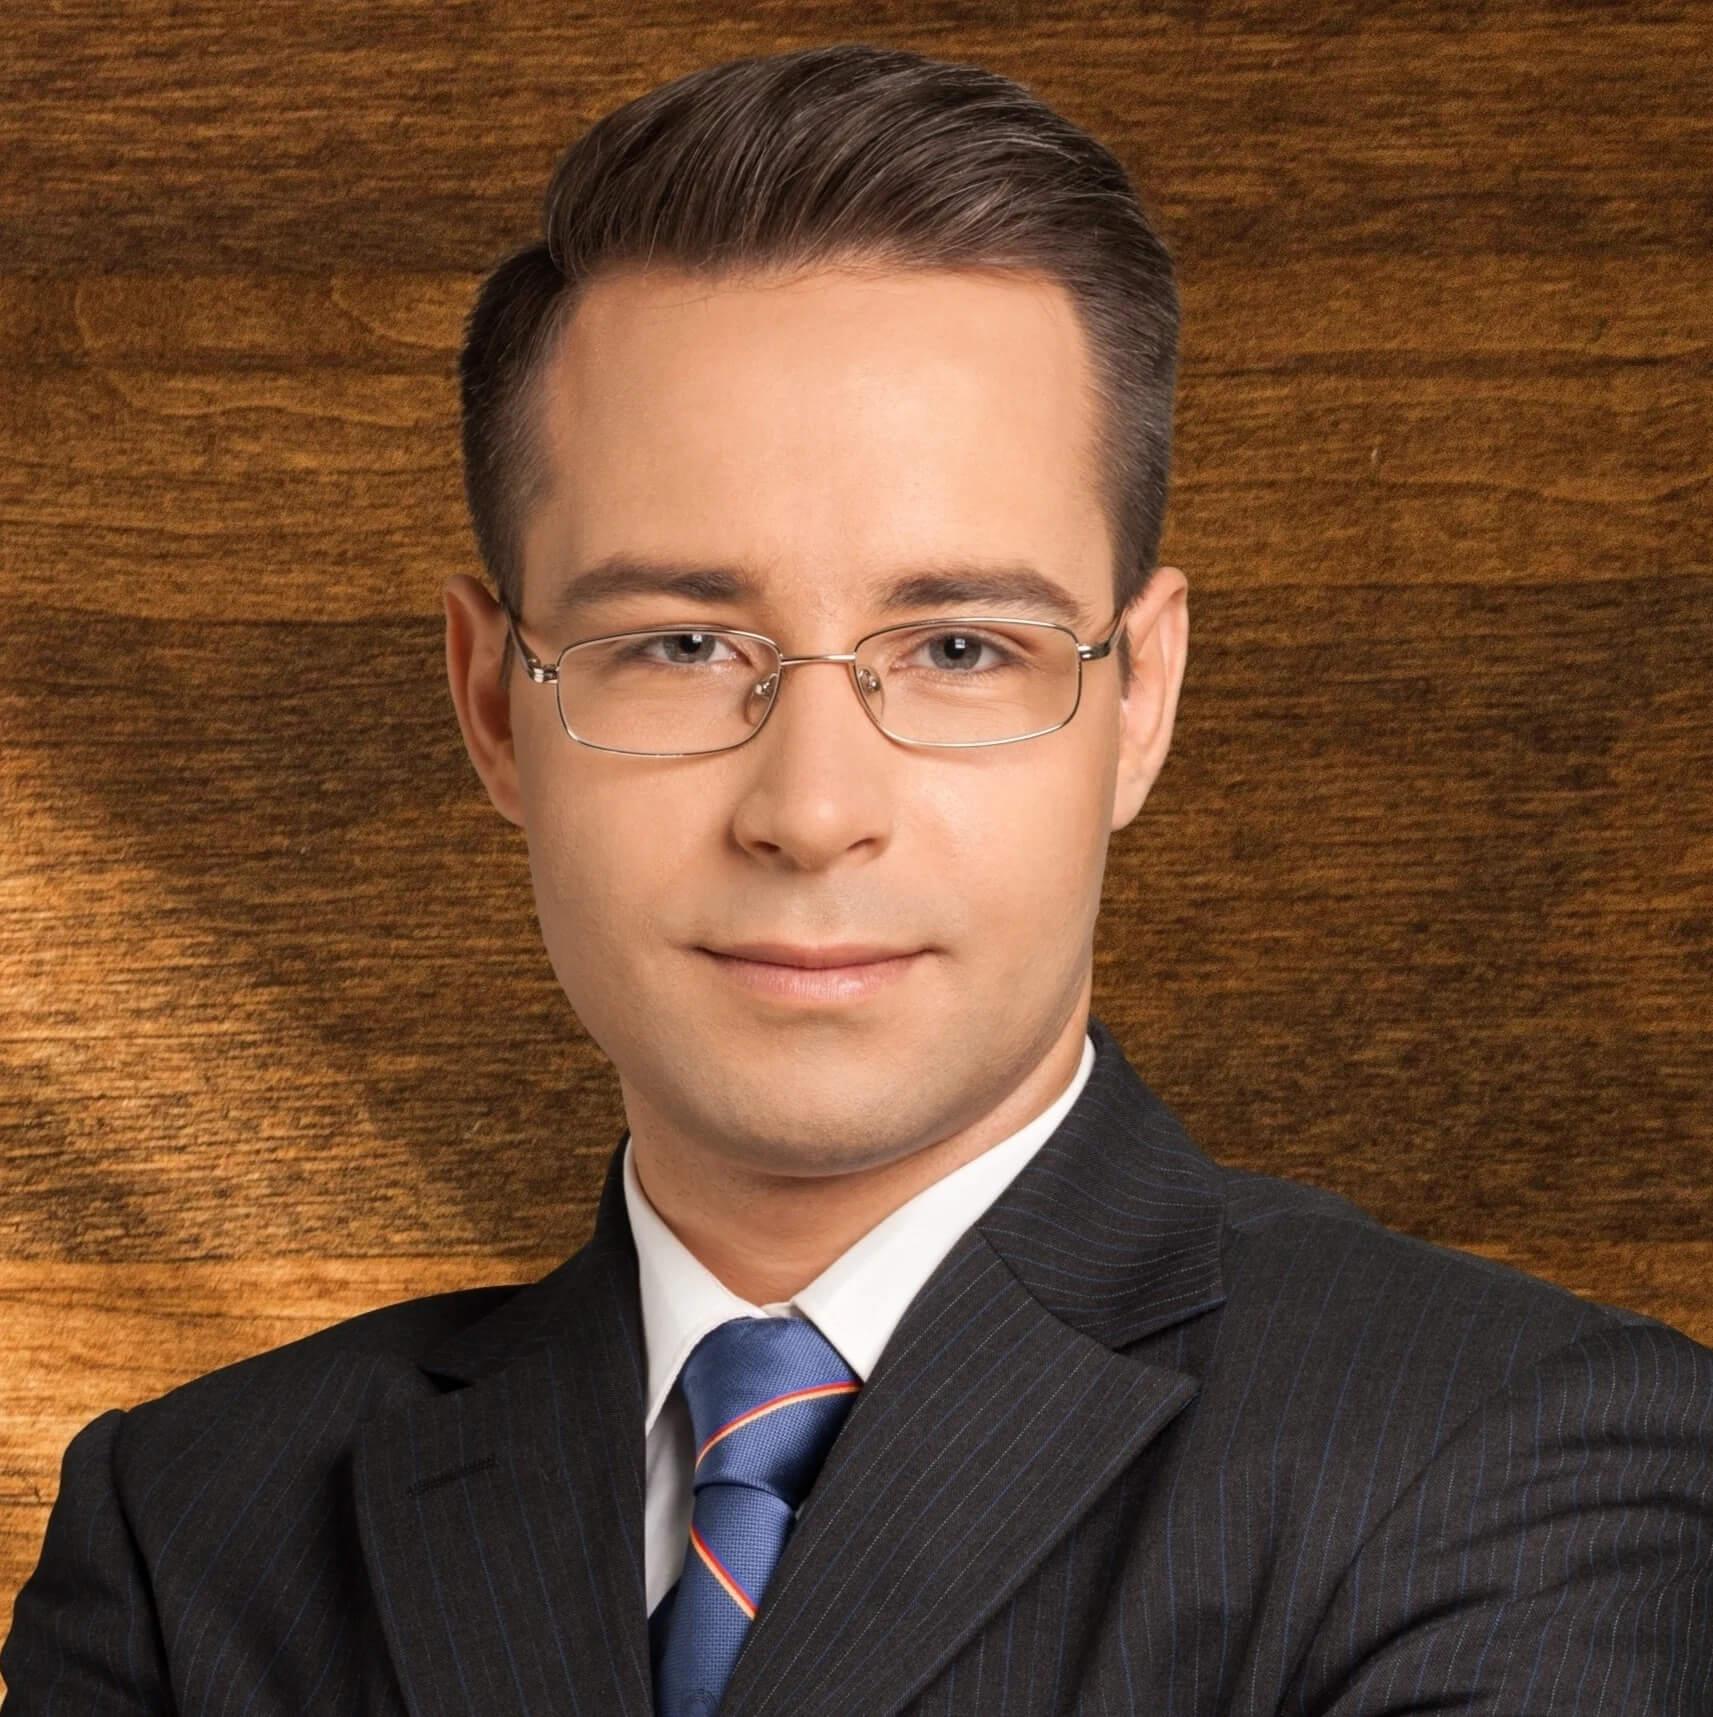 portrait man glasses wood panel lawyer office